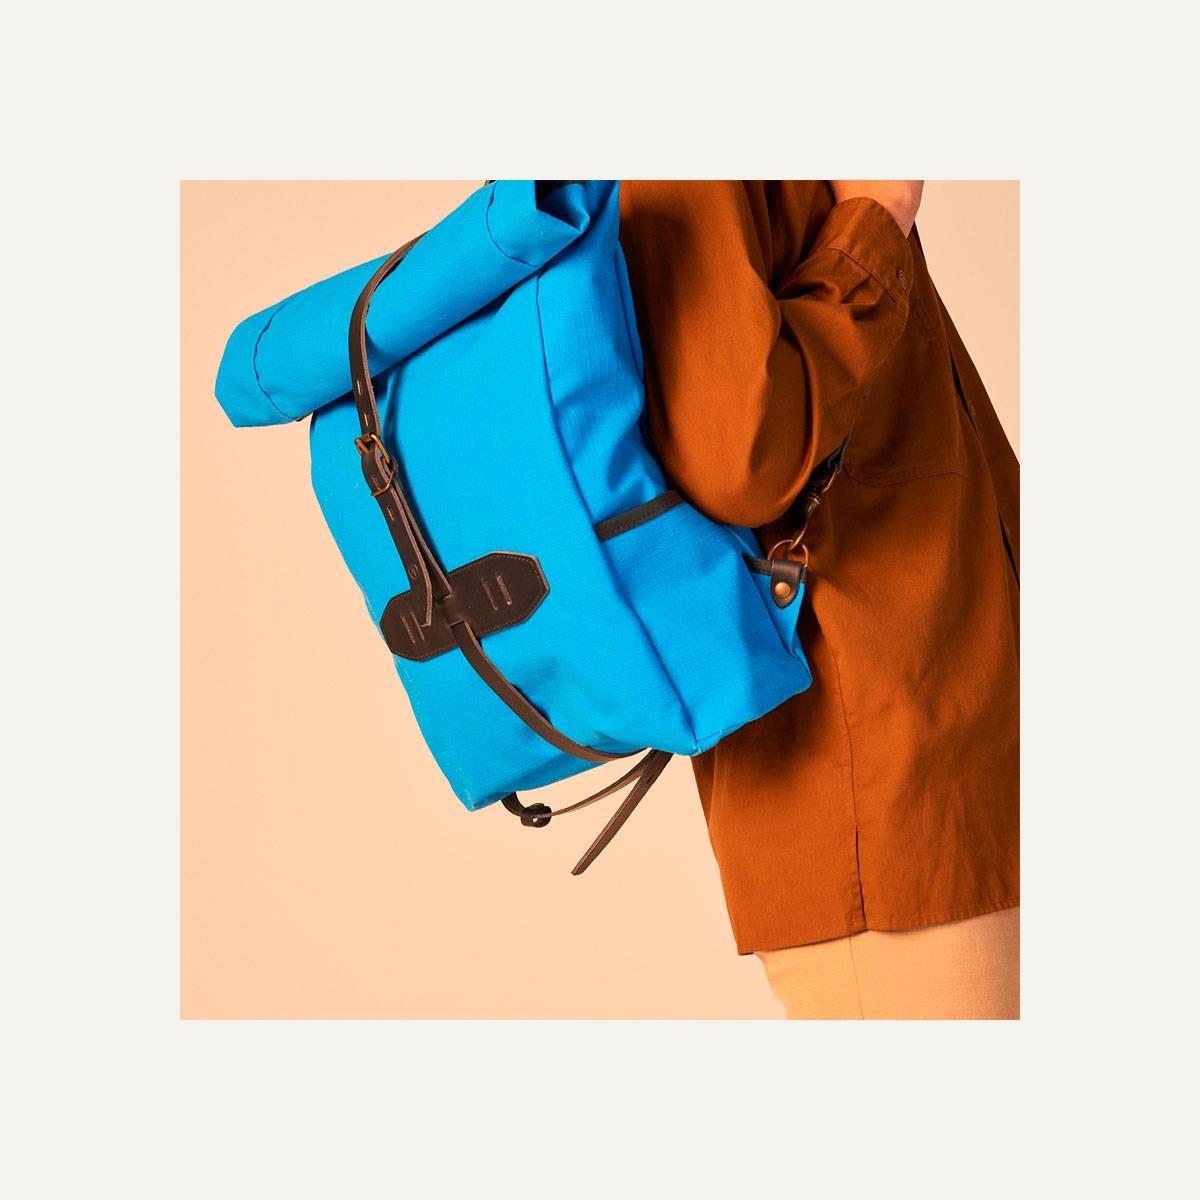 Jamy Backpack - Regentex Blue (image n°10)